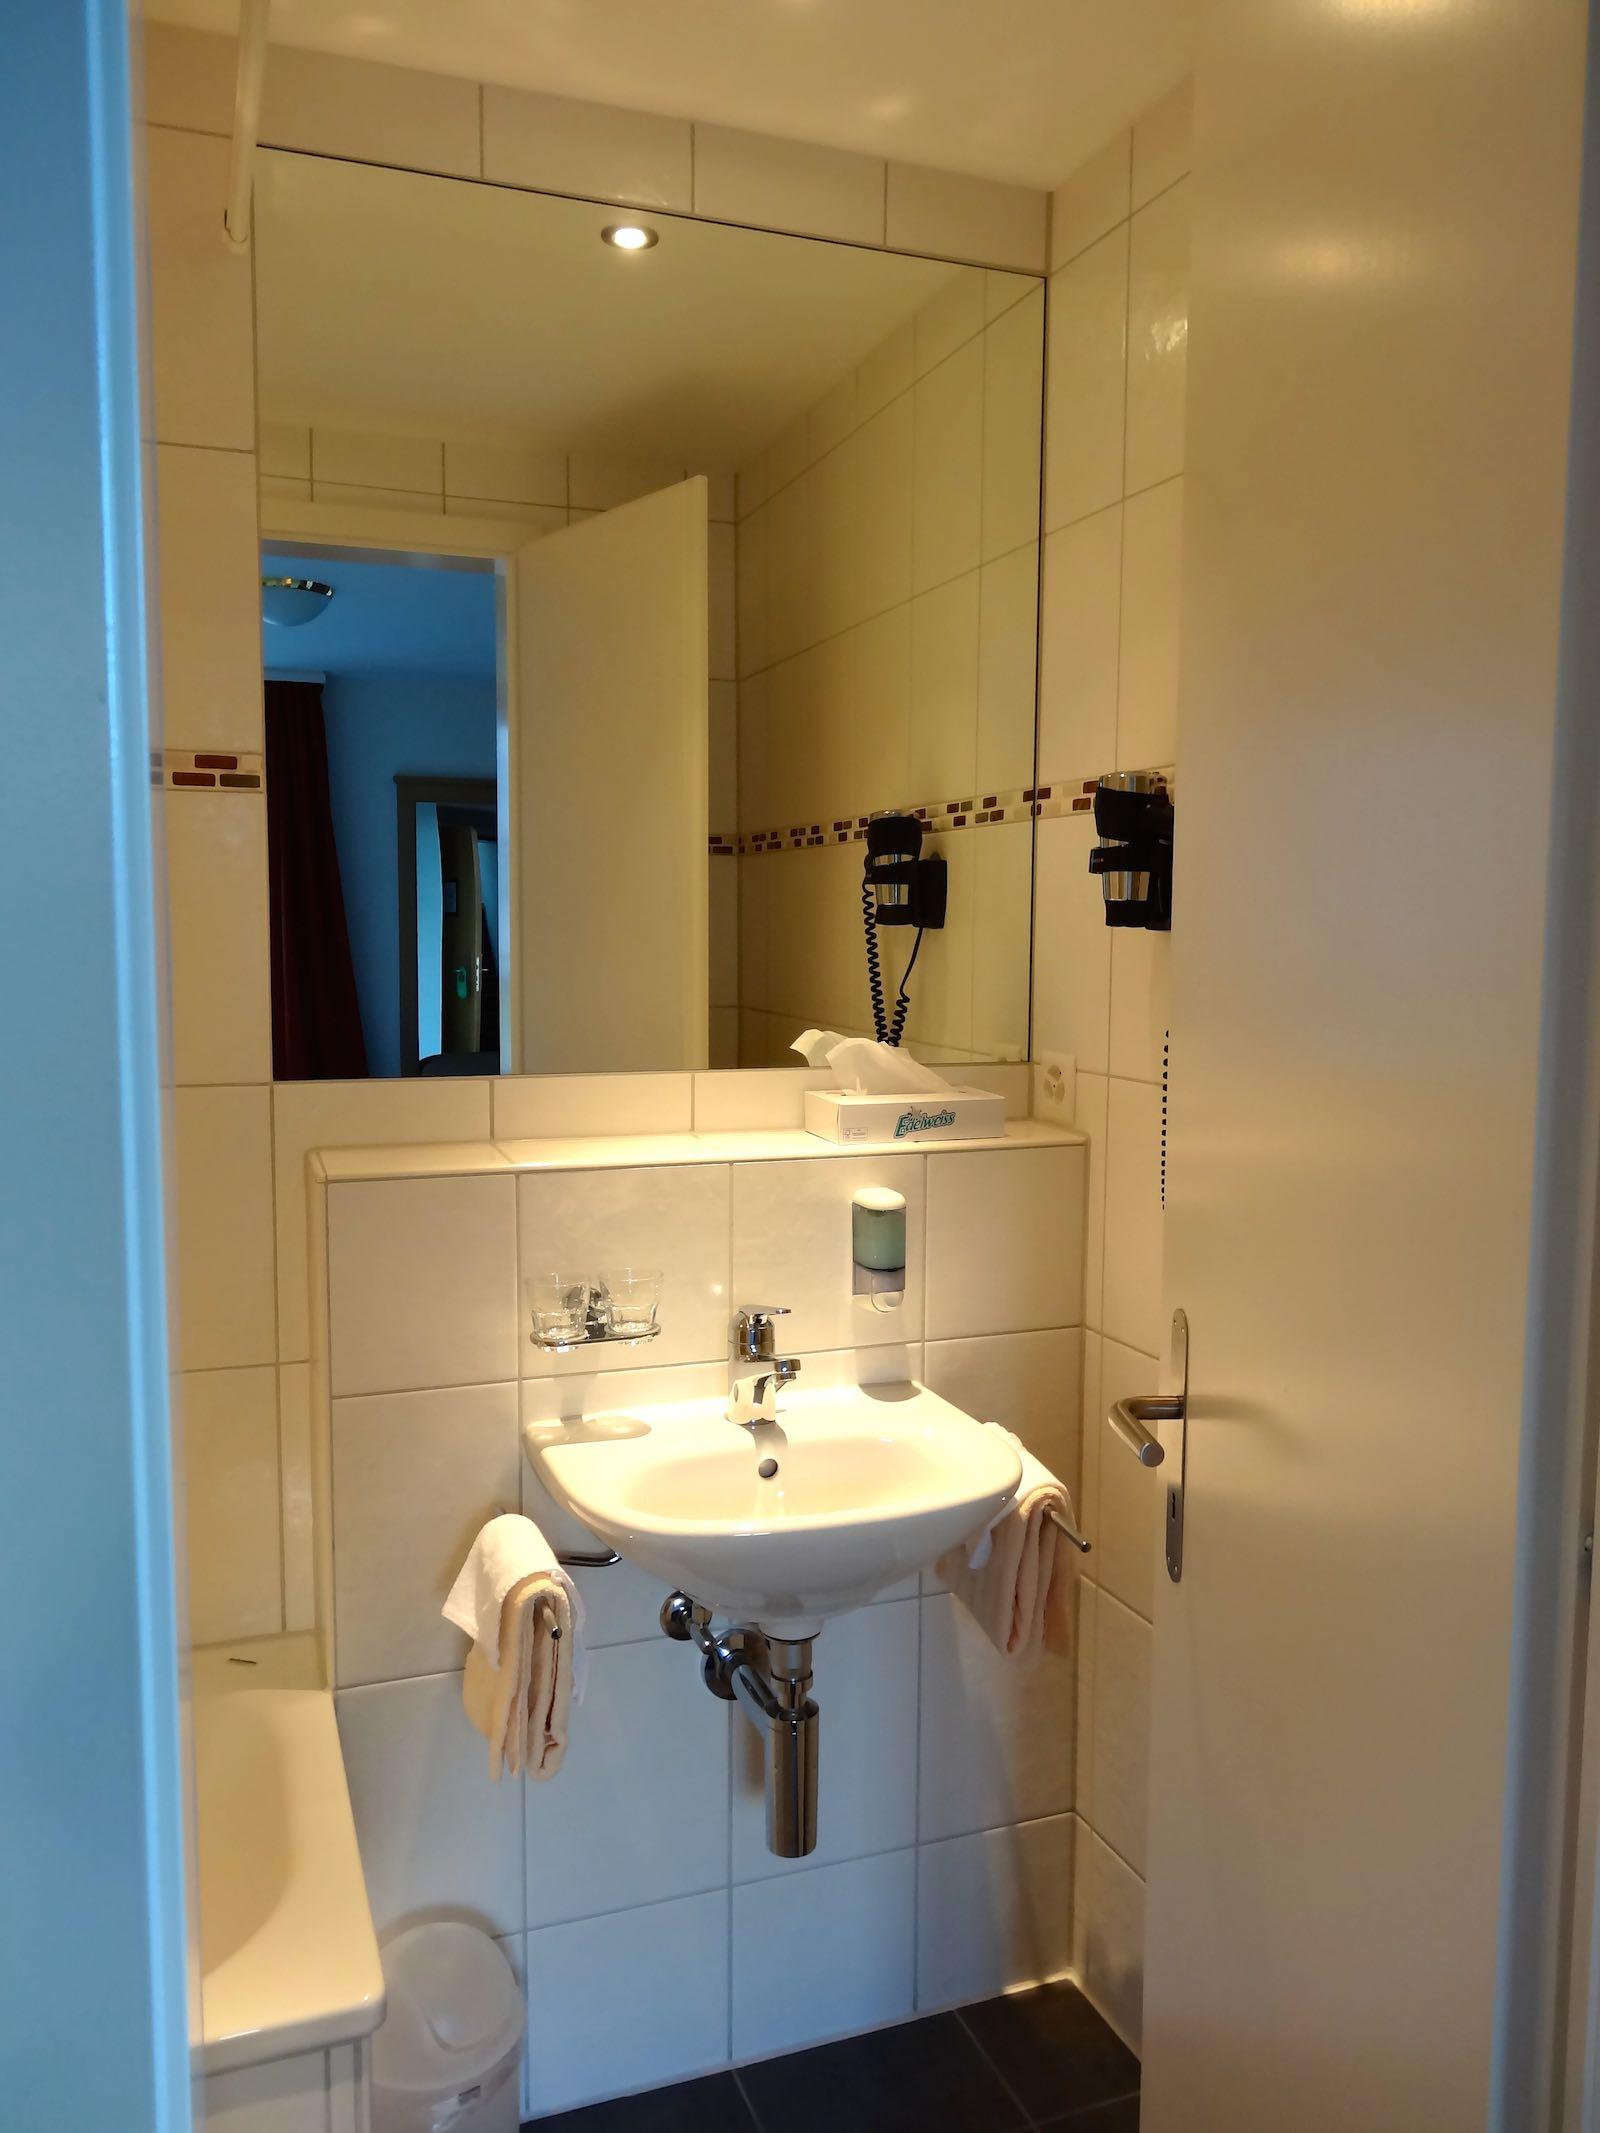 http://hoteljungfrau.ch/wp-content/uploads/2014/11/superior-zimmer-9.jpg